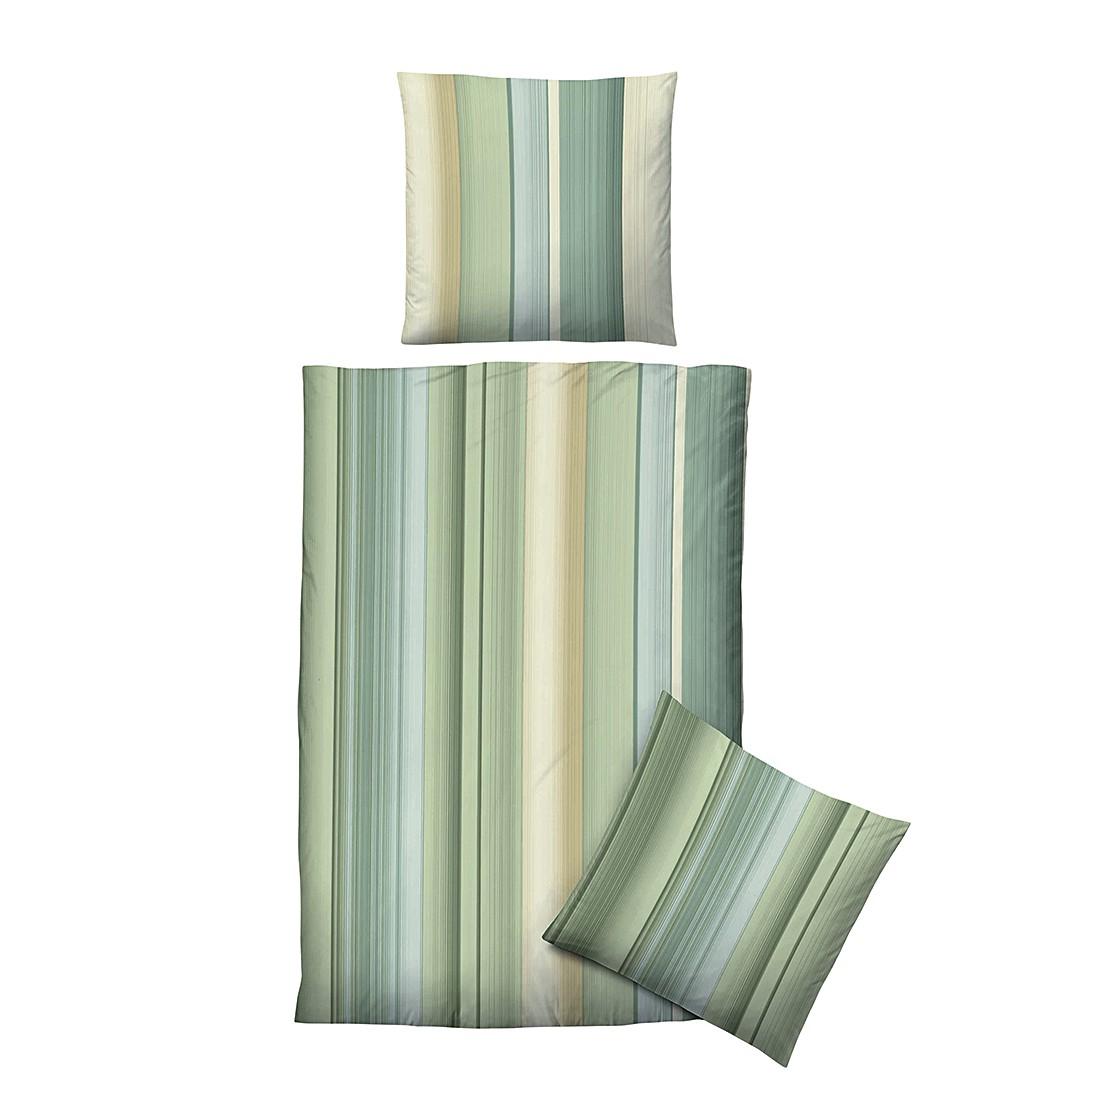 Baumwoll Jersey Bettwäsche Grün Gestreift 220x155cm Biberna Kaufen